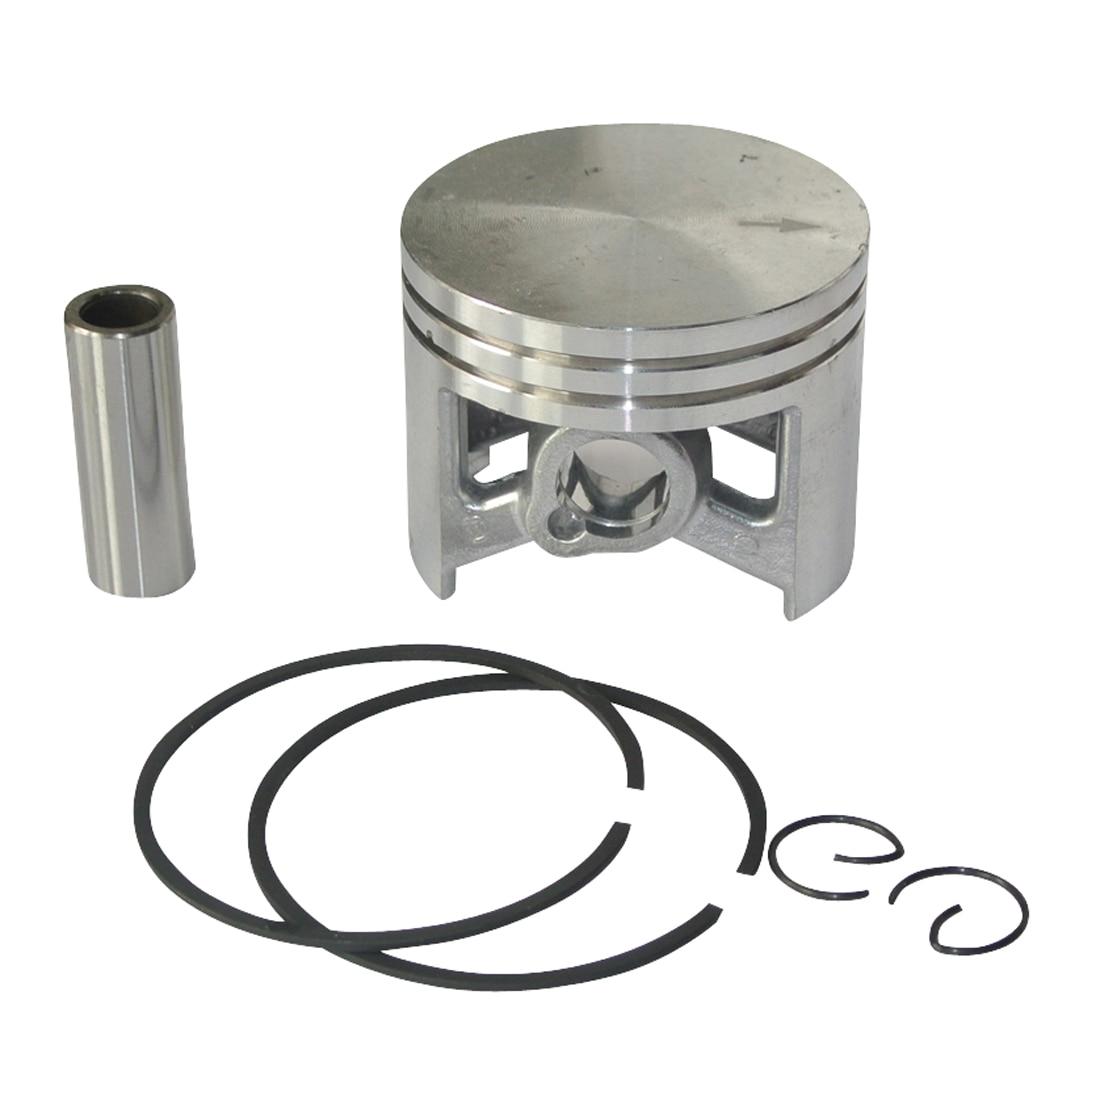 044 Cylinder Fit 50MM MS440 STIHL Nikasil Chainsaw Kit Ring Piston 1226 020 1128